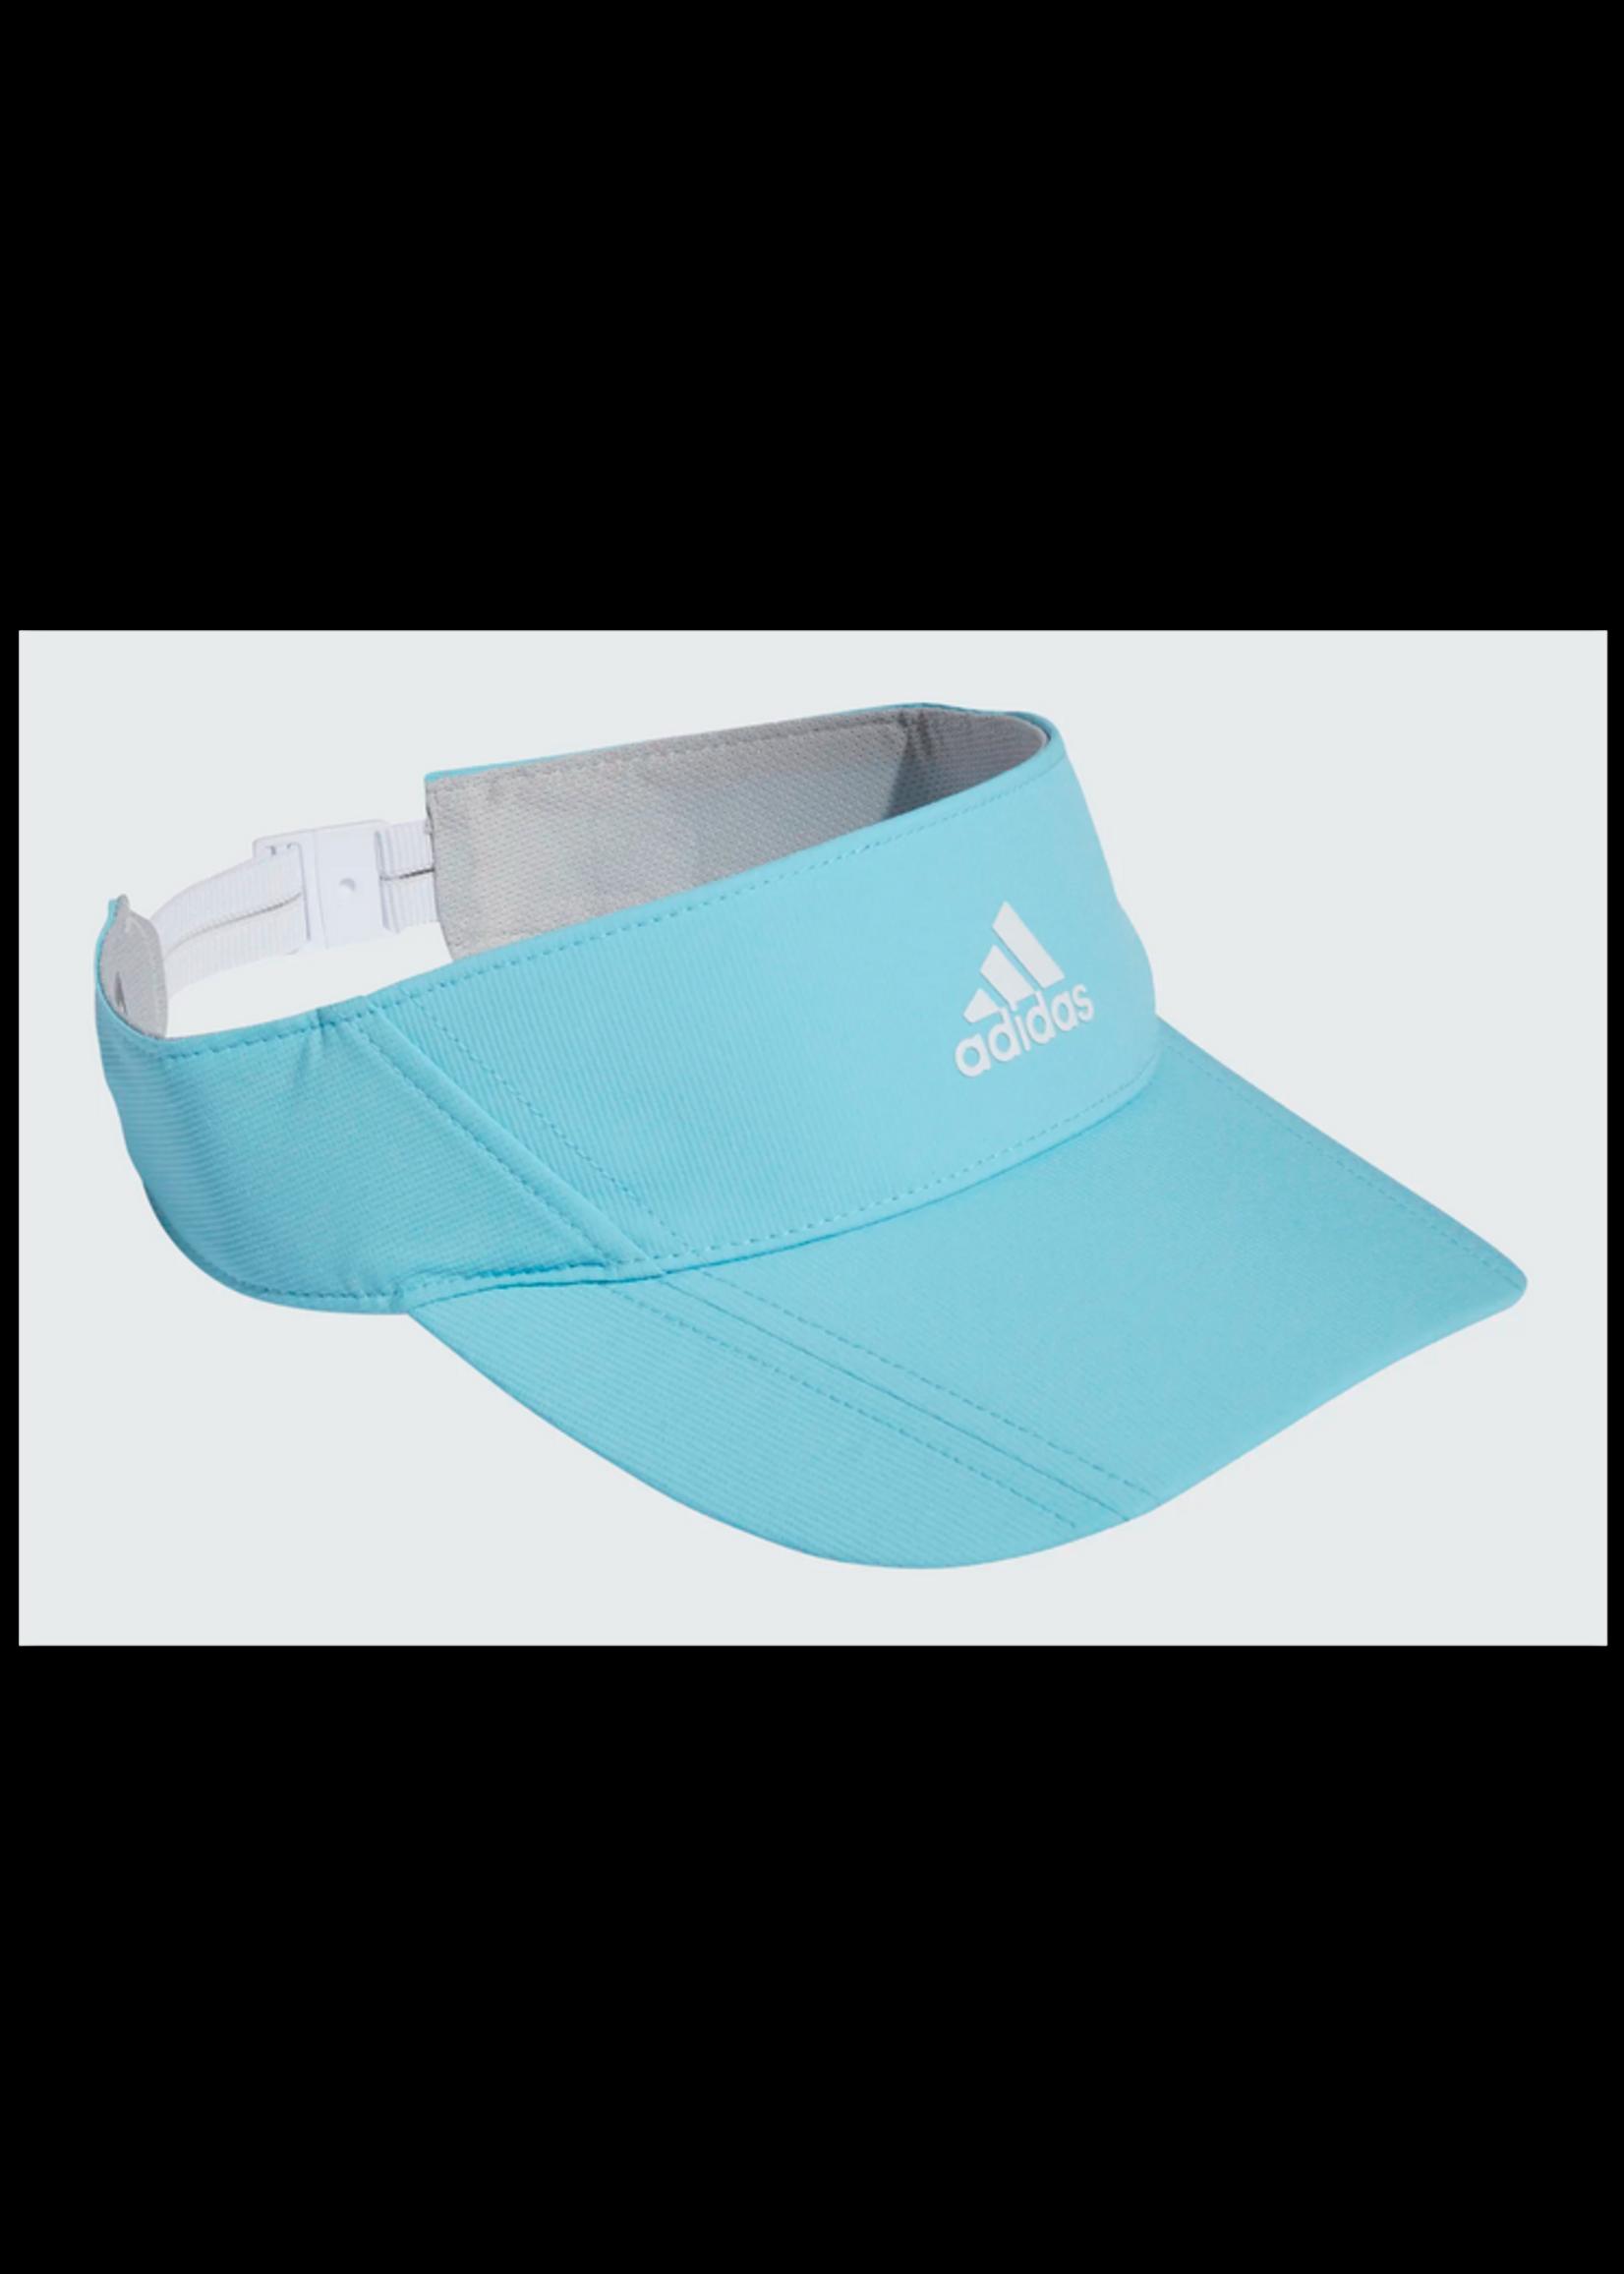 Adidas Adidas Comfort Visor - Various Colours (2021)